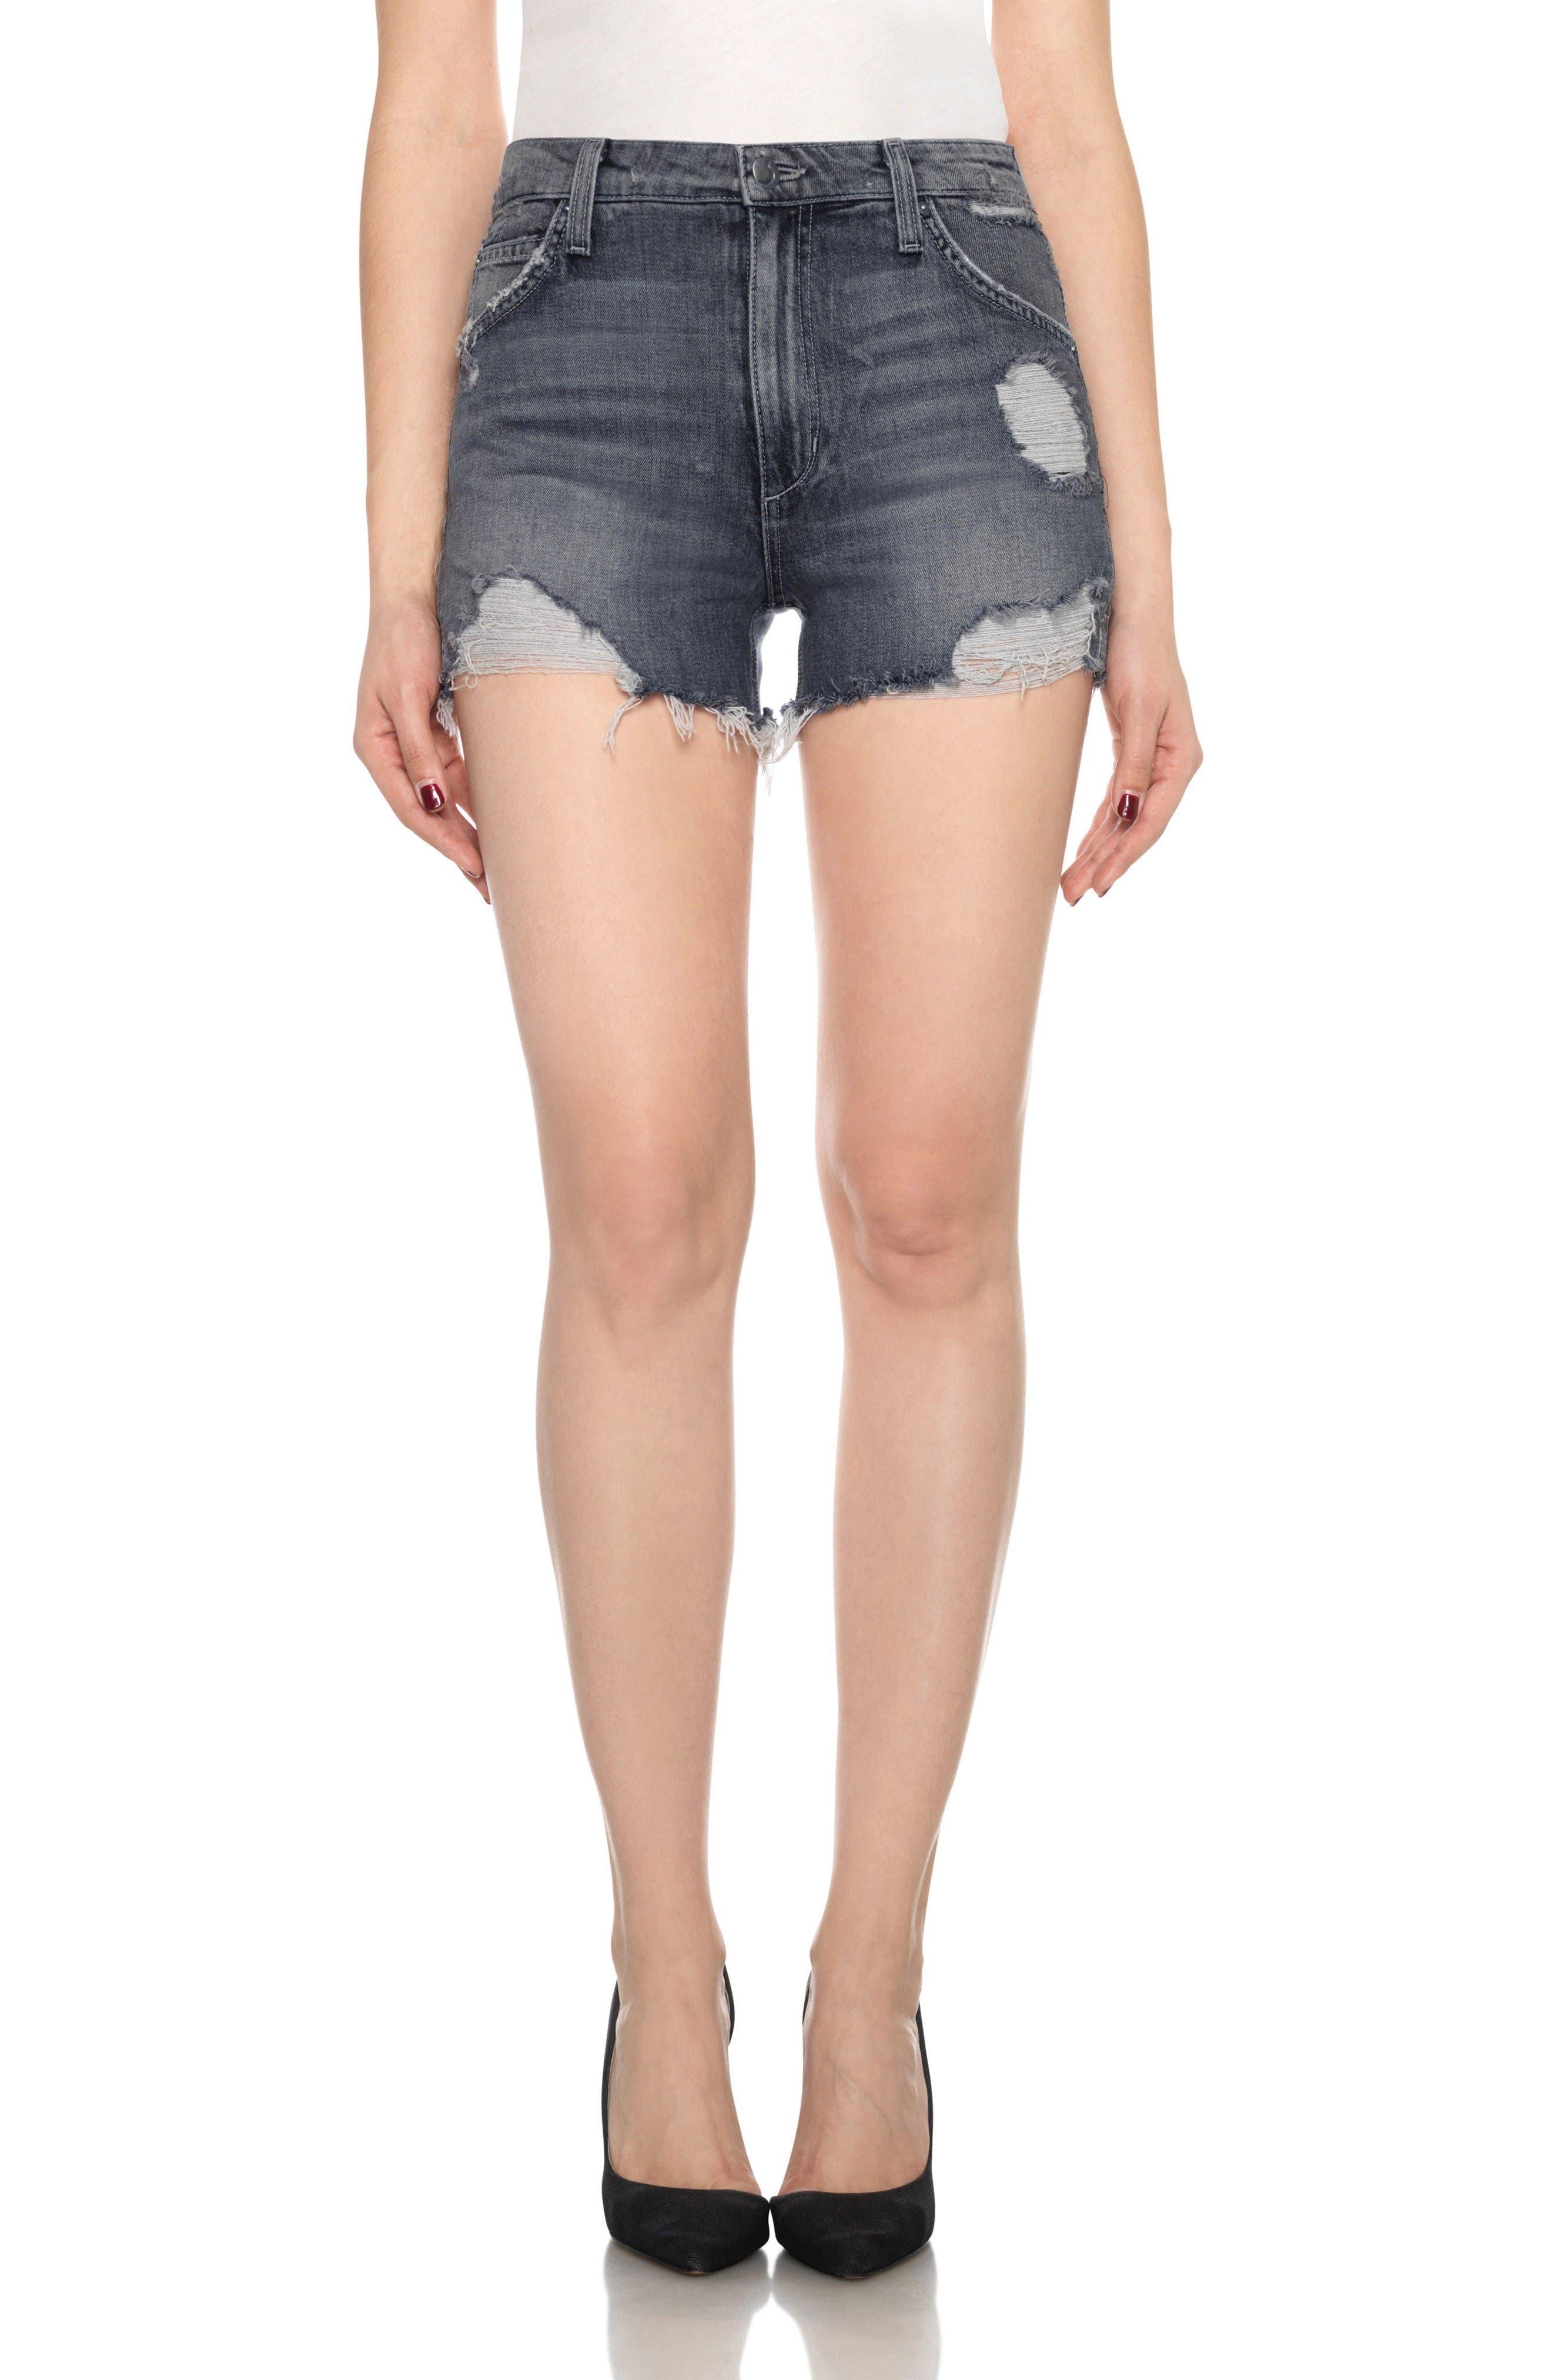 Alternate Image 1 Selected - Joe's Collector's - Bella High Waist Cutoff Denim Shorts (Enni)